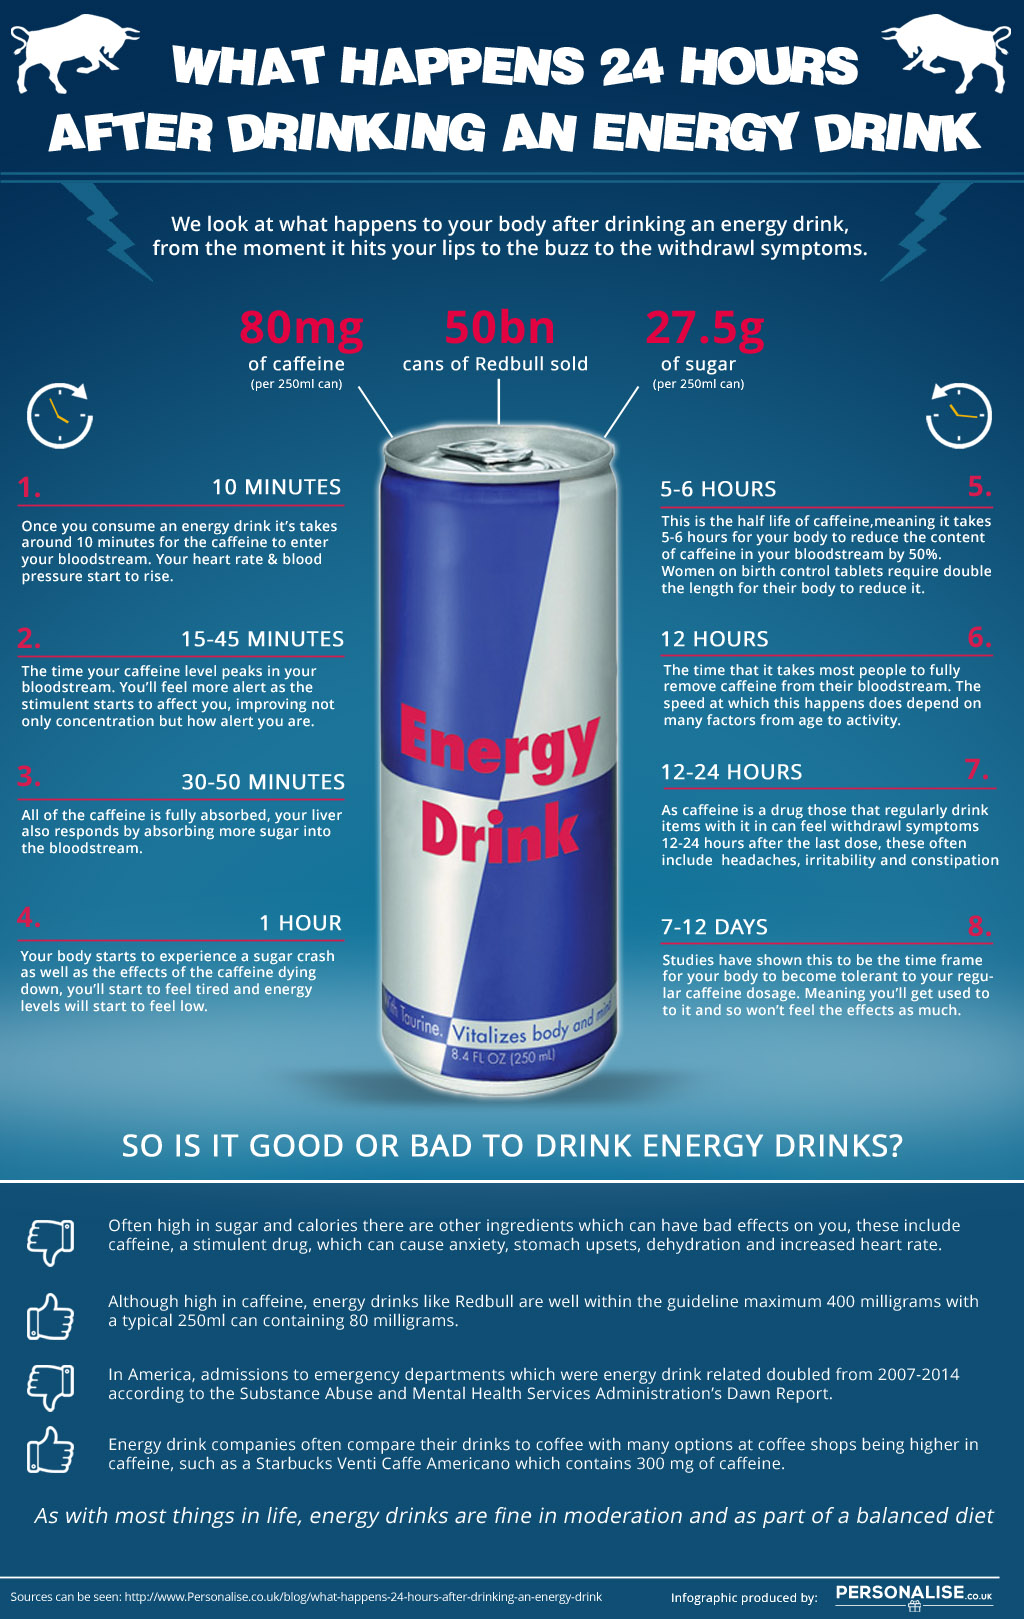 Impact Of Energy Drinks On Health